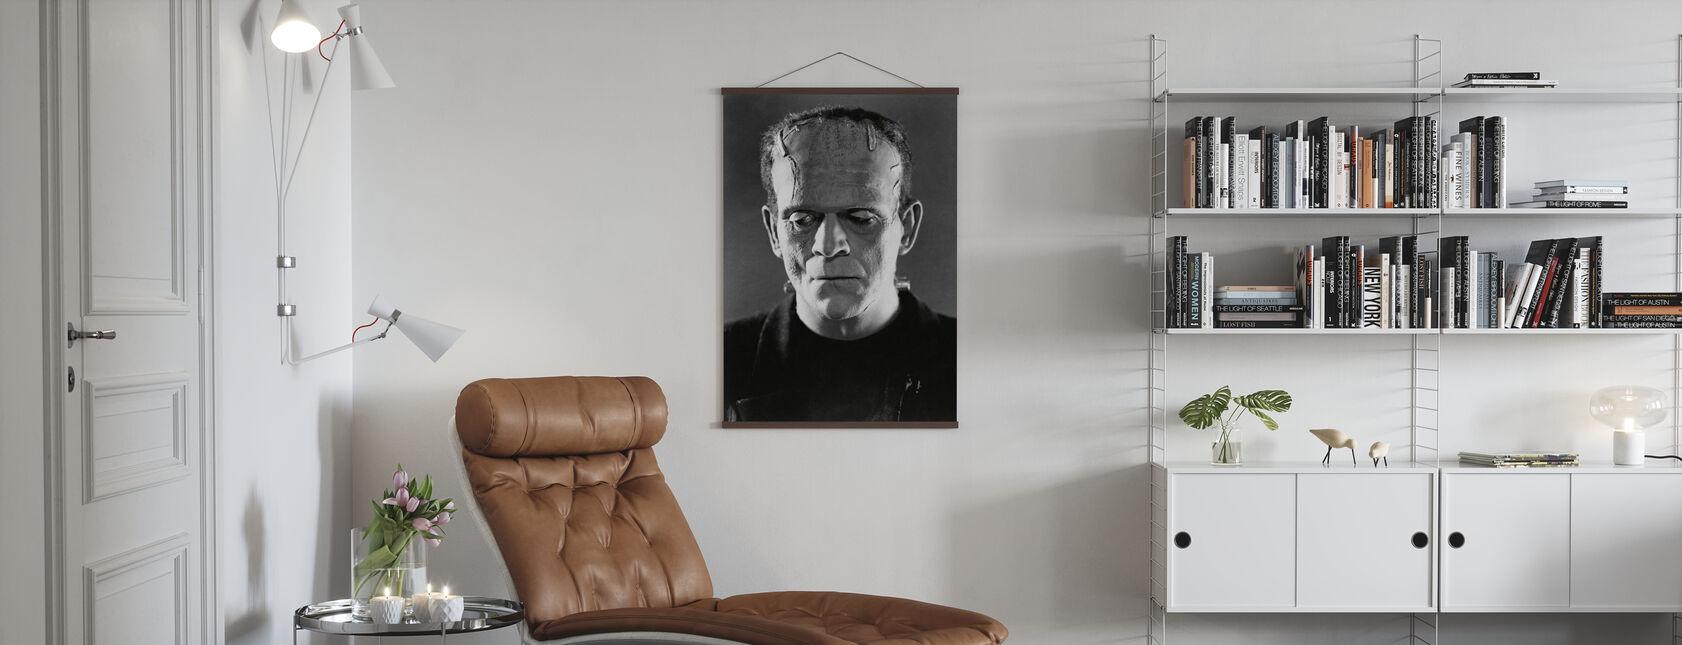 Boris Karloff i Frankensteins brud - Poster - Vardagsrum